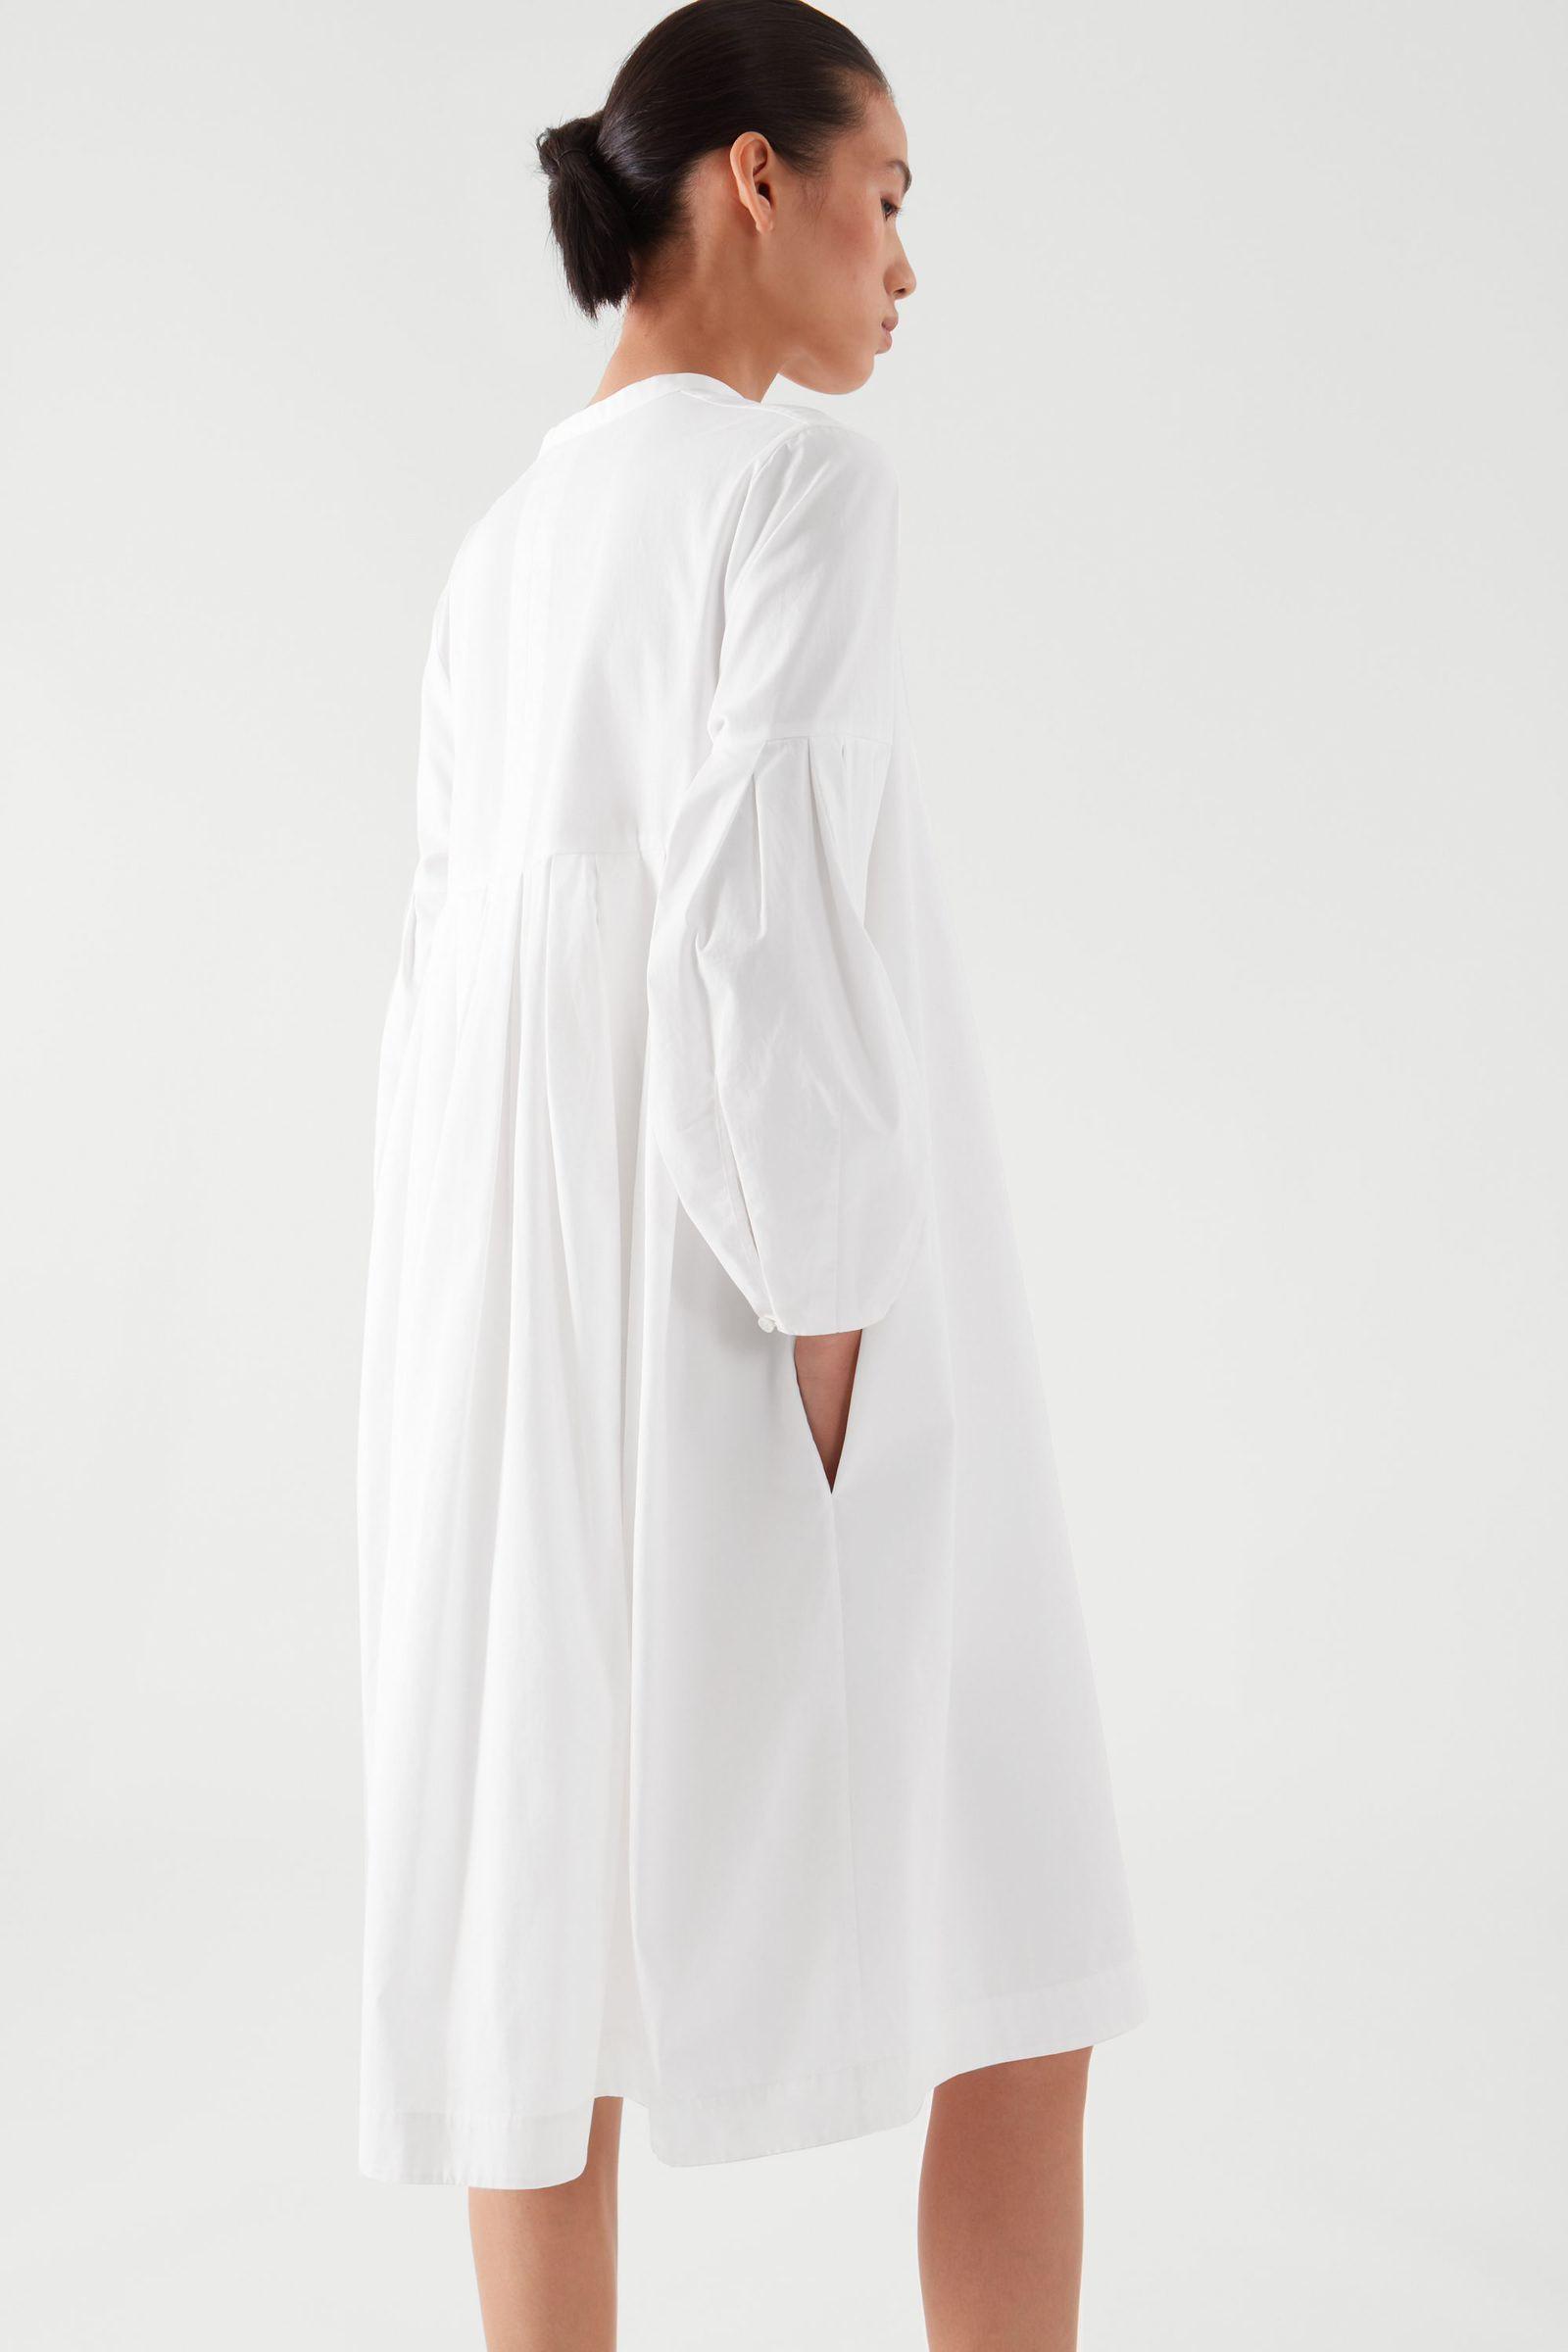 COS 플리티드 셔츠 드레스의 화이트컬러 ECOMLook입니다.